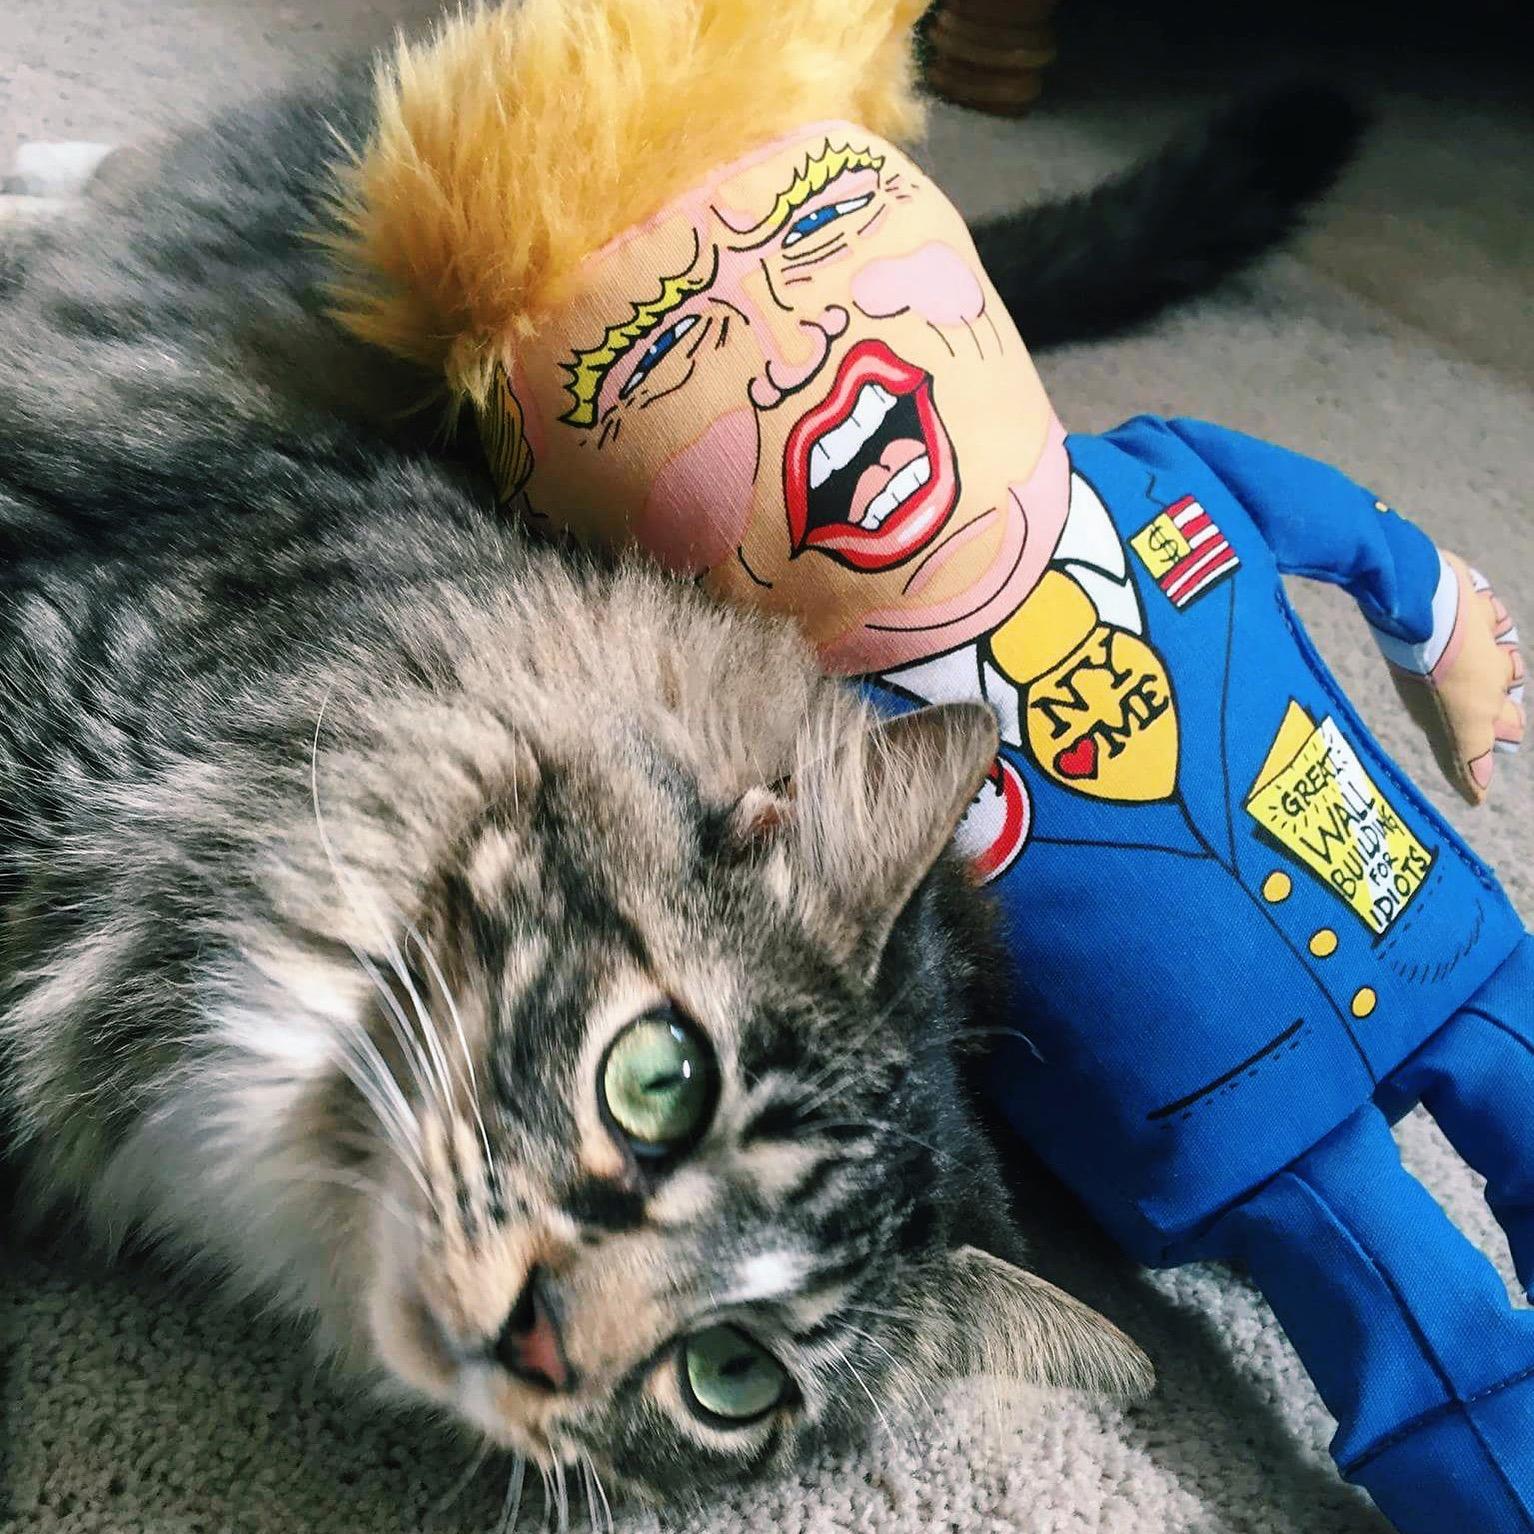 Some cats prefer dog toys